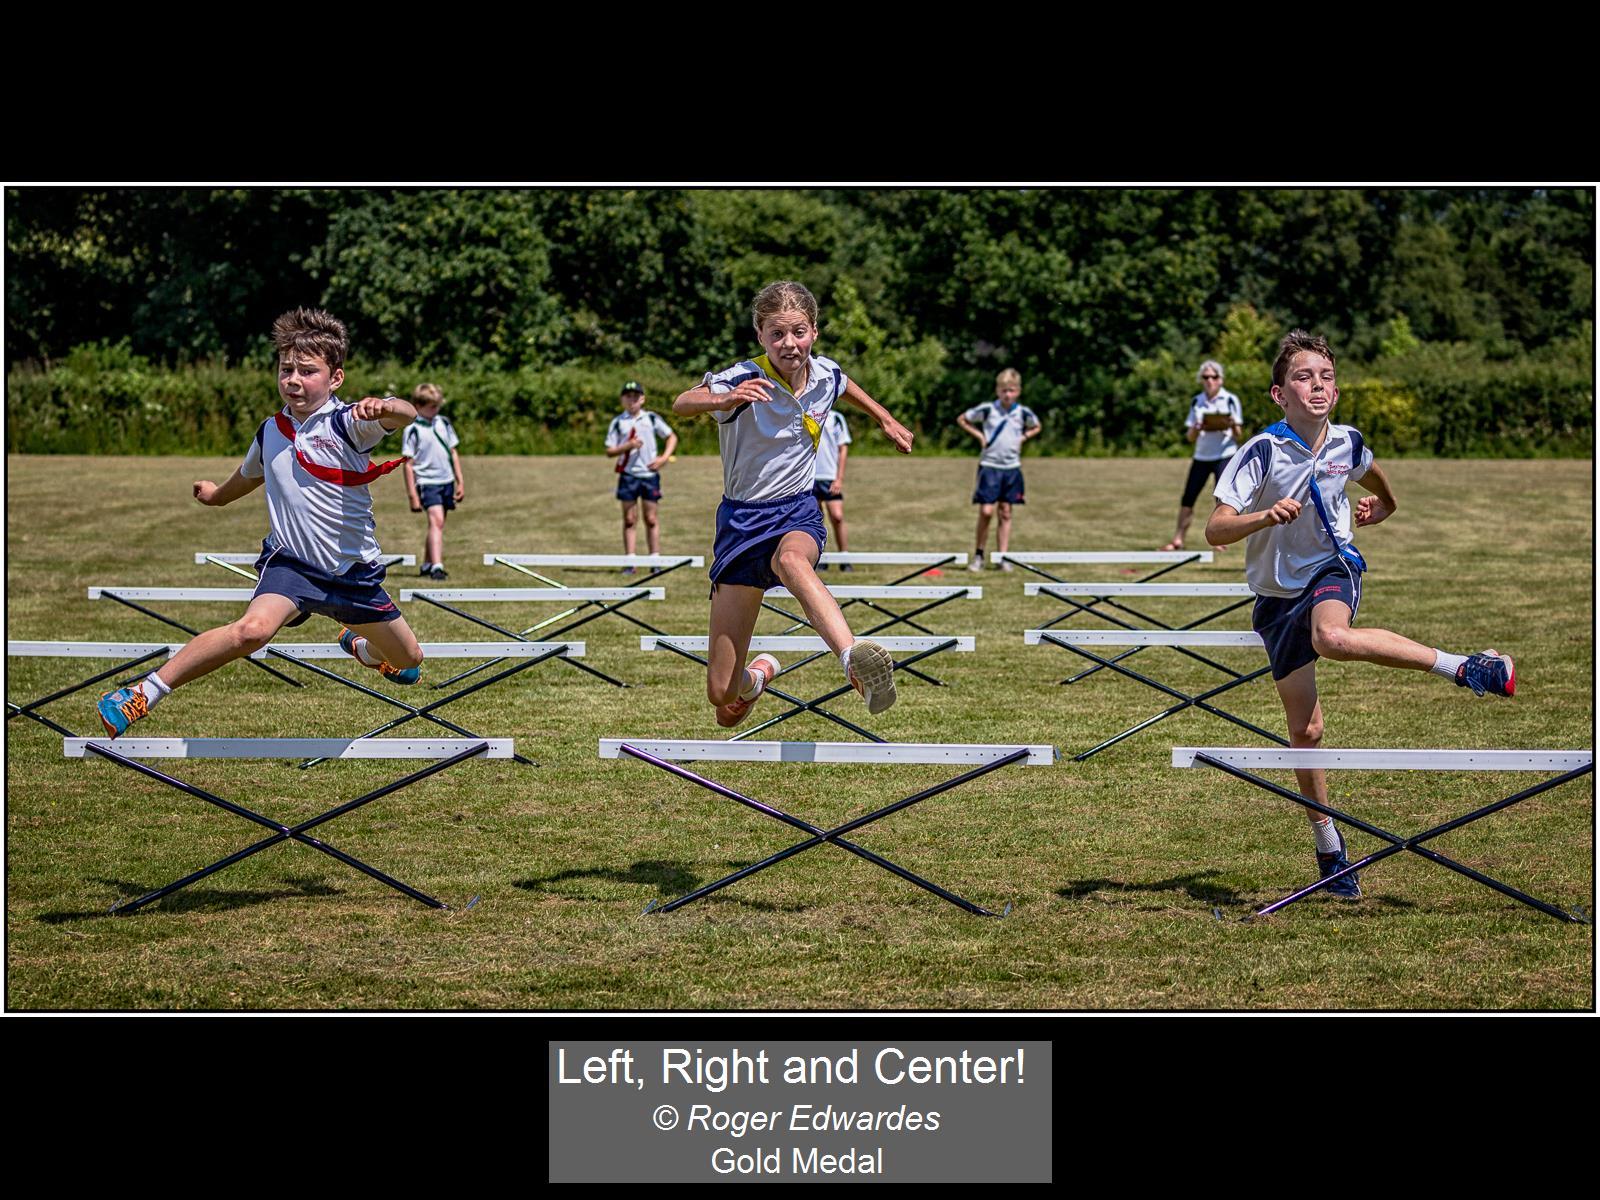 Left, Right and Center!_Roger Edwardes_G